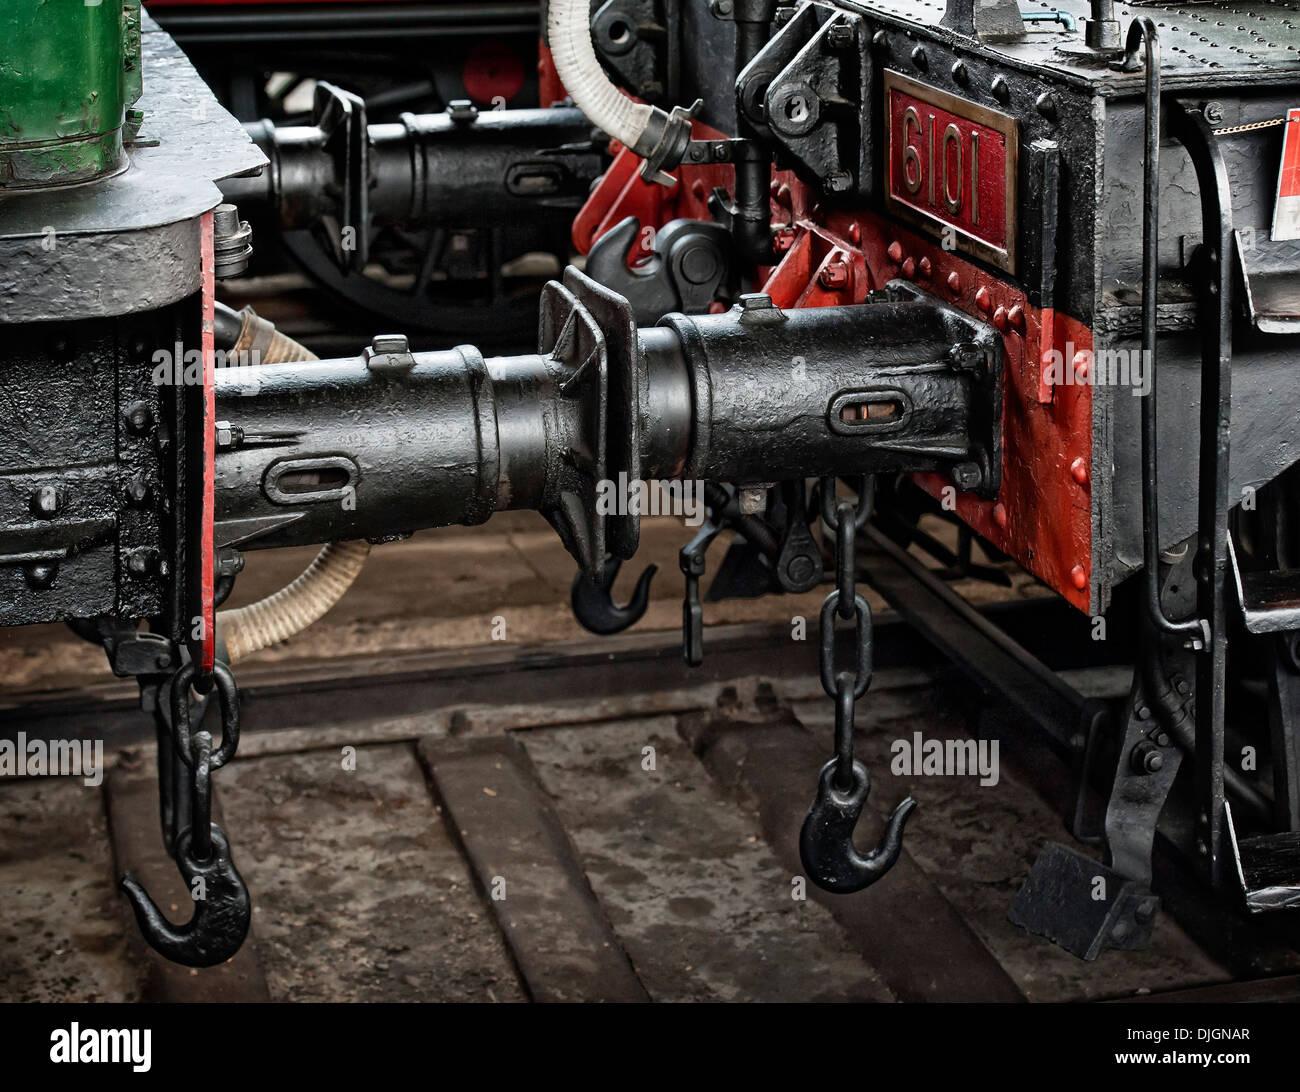 Wagon locomotive train assembly - Stock Image